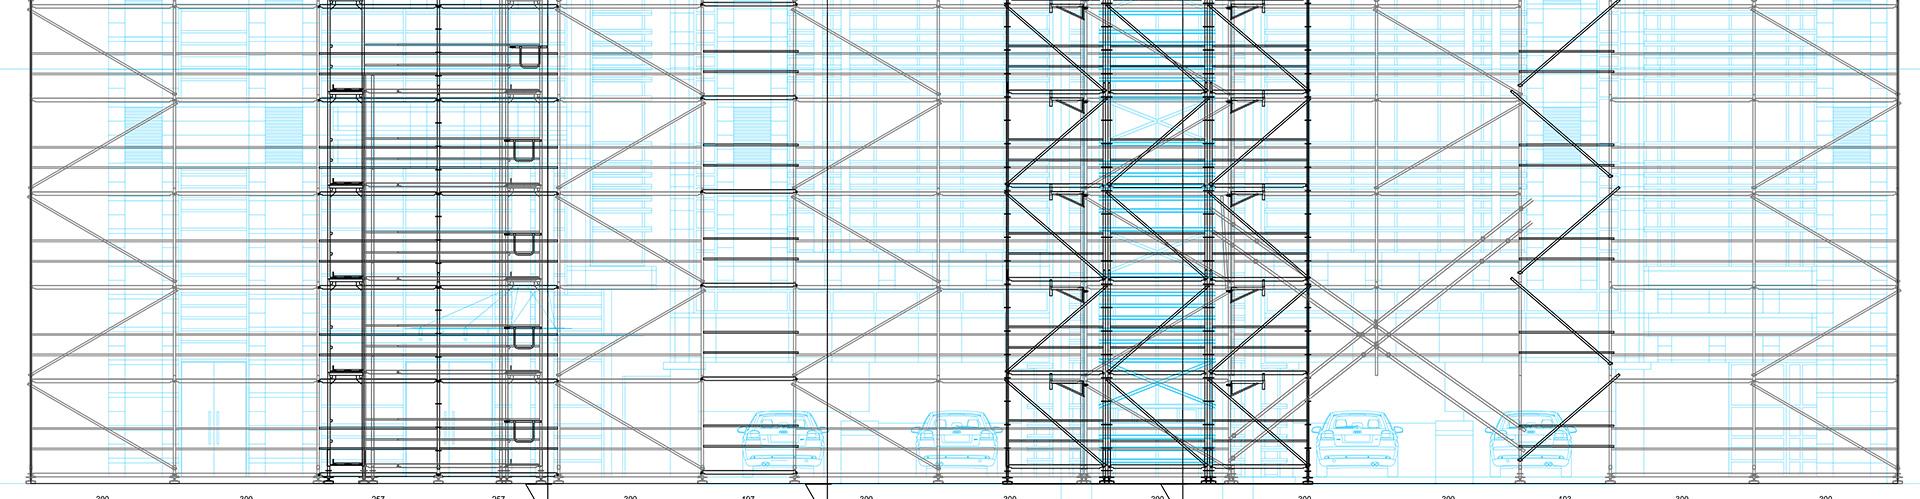 Izrada Projekata - Elaborata Skelskih Konstrukcija